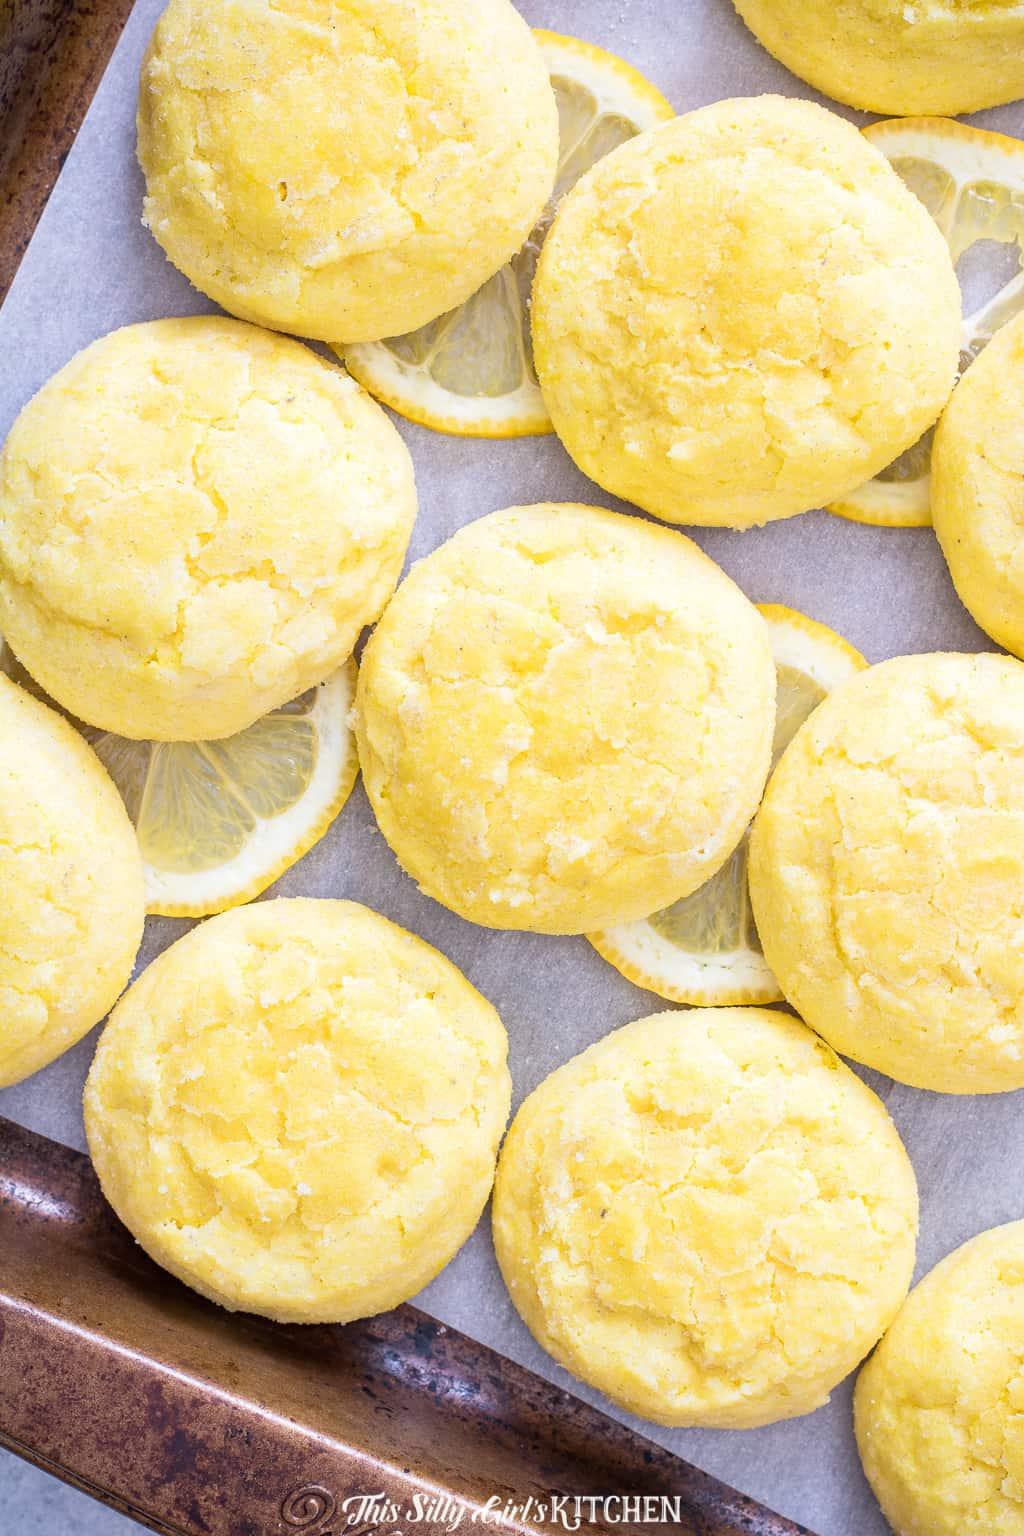 Meltaway Lemon Cookies on sheet pan with lemon slices